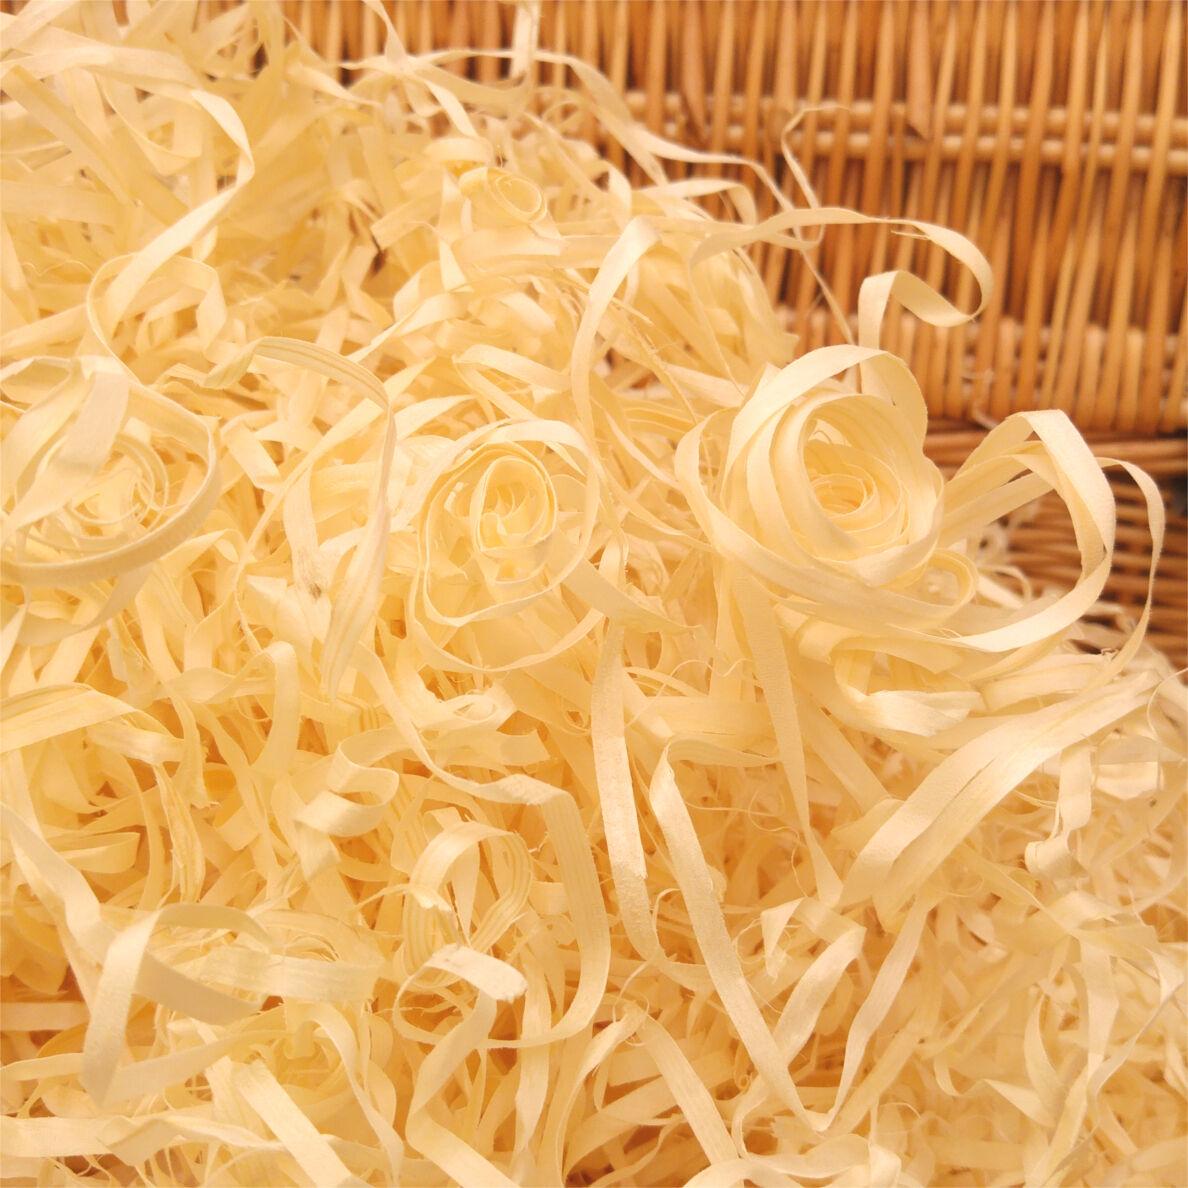 1 Kg Secado Lana de madera Embalaje Relleno Cesta Cesta de Regalo para Relleno Juguetes